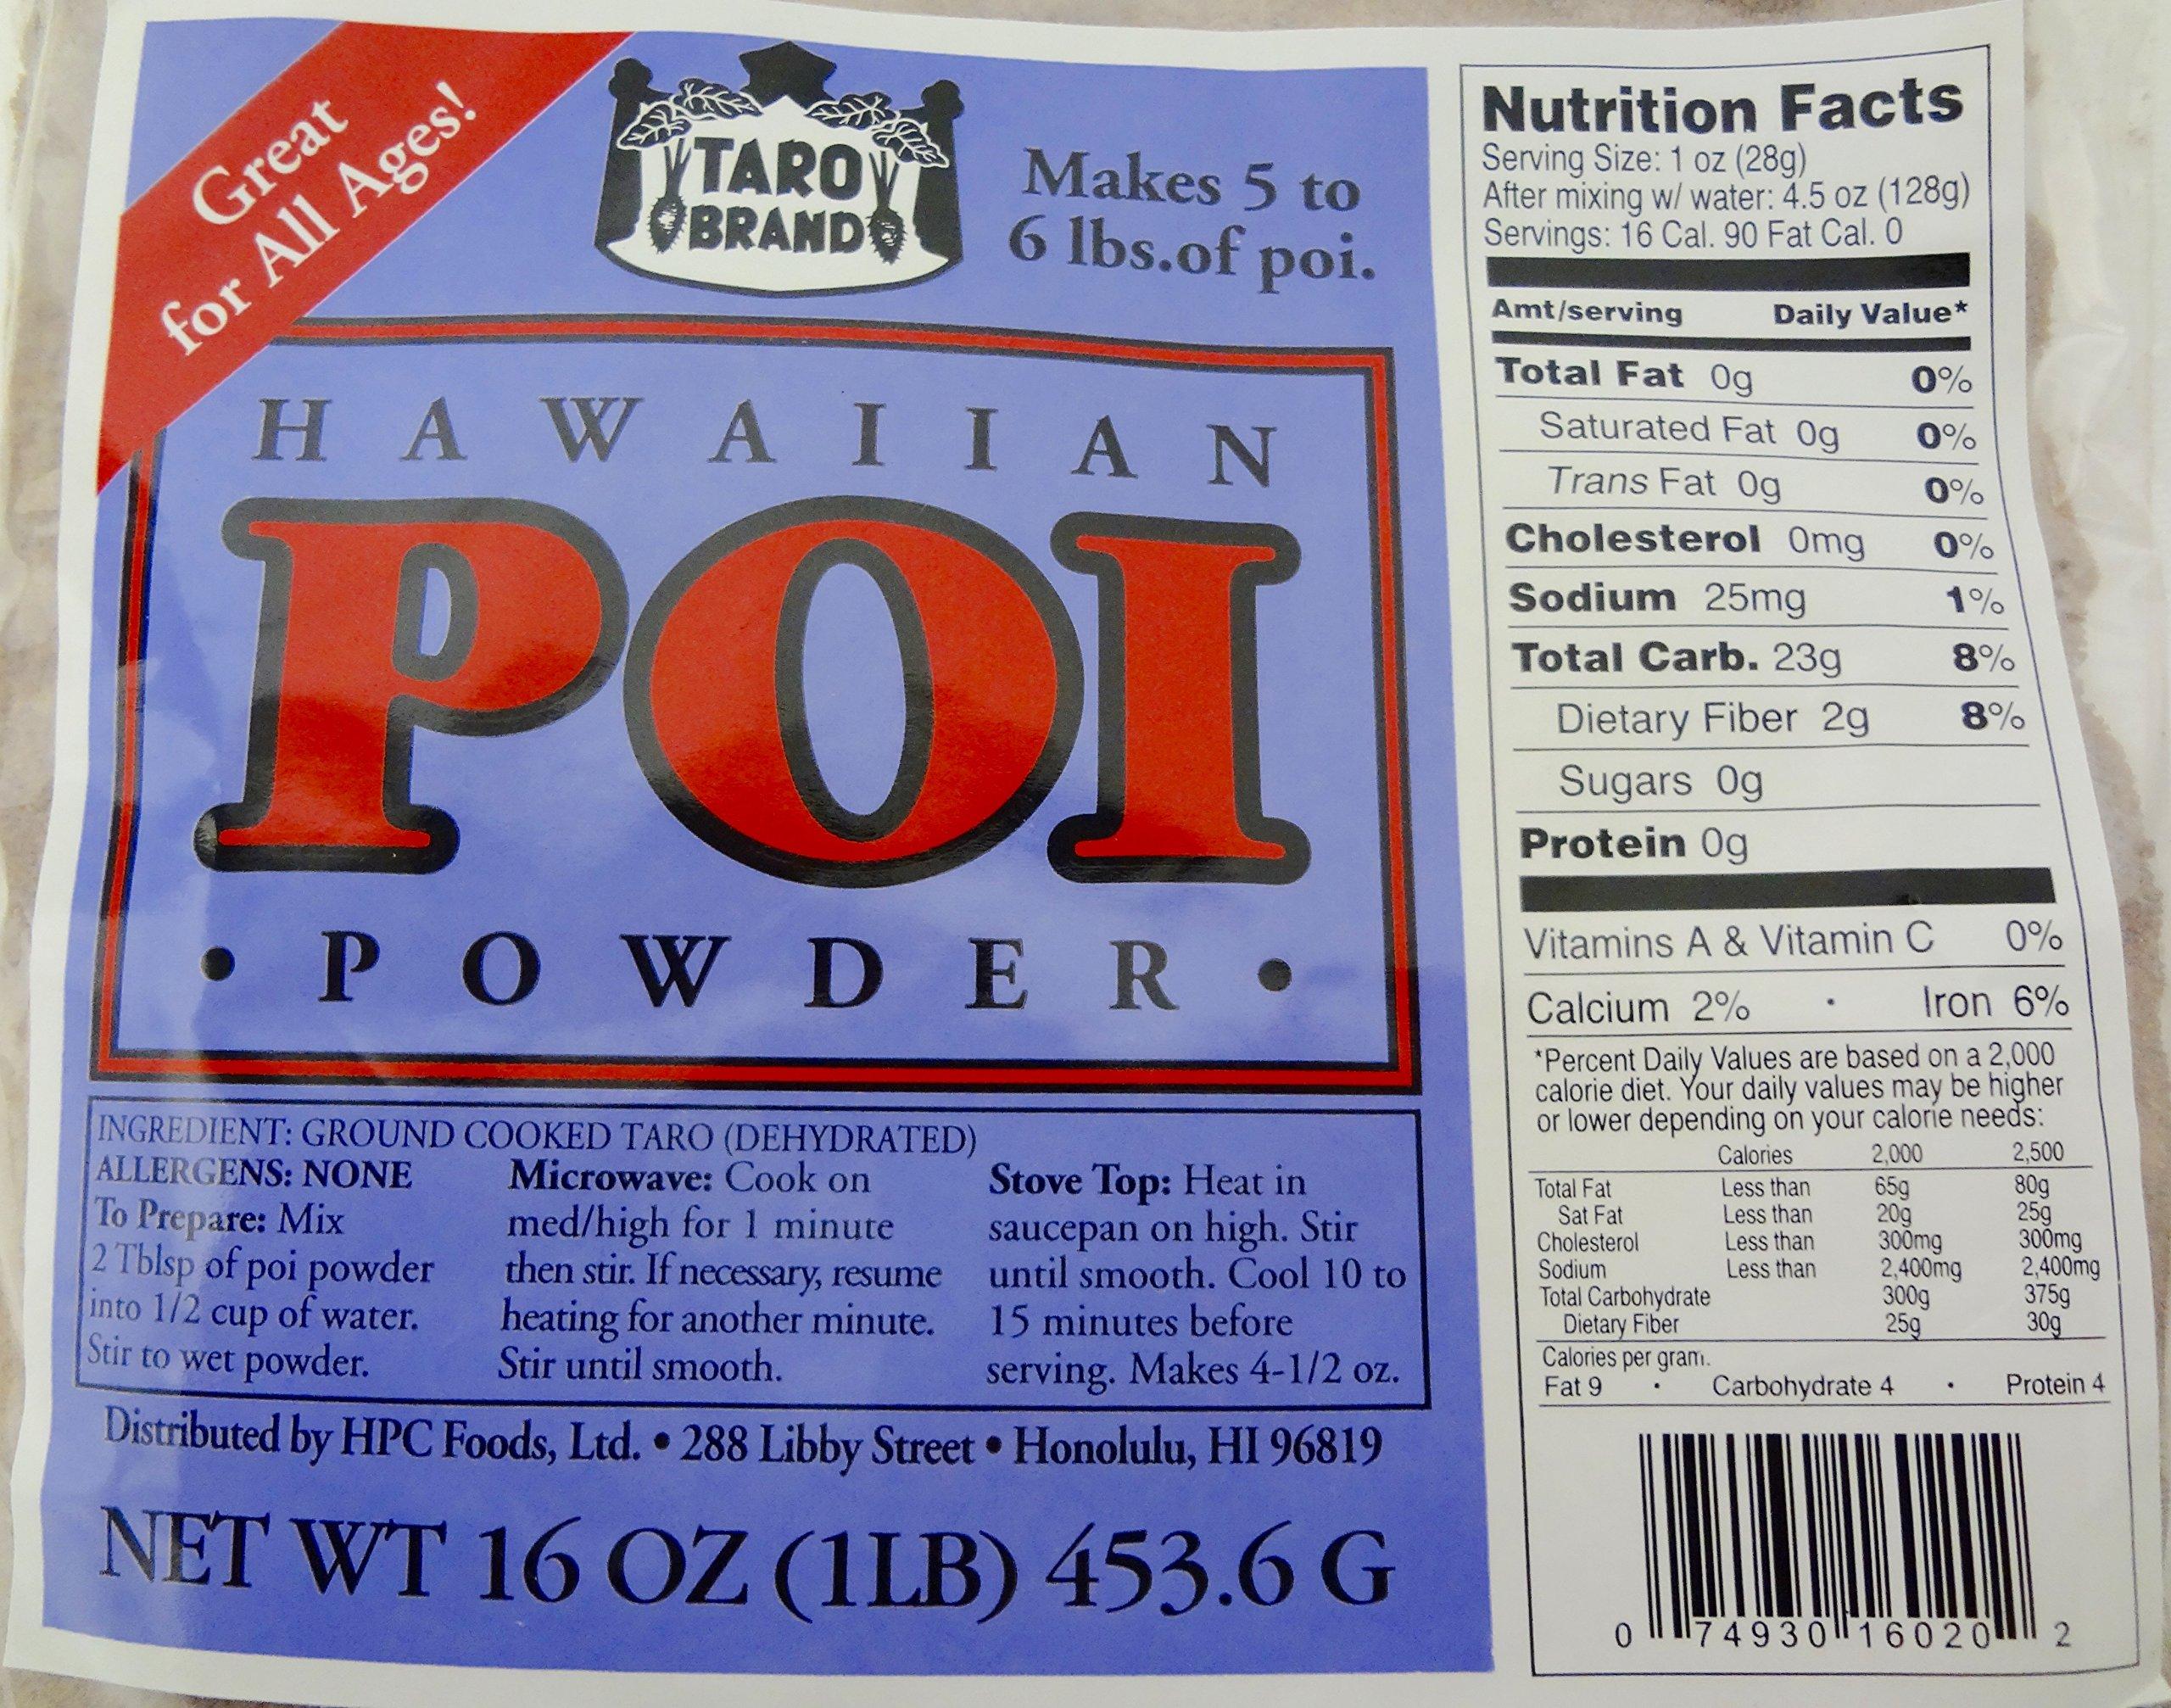 Hawaiian Poi Powder 1lb Bag - Makes 5 - 6 Pounds of Hawaii Poi